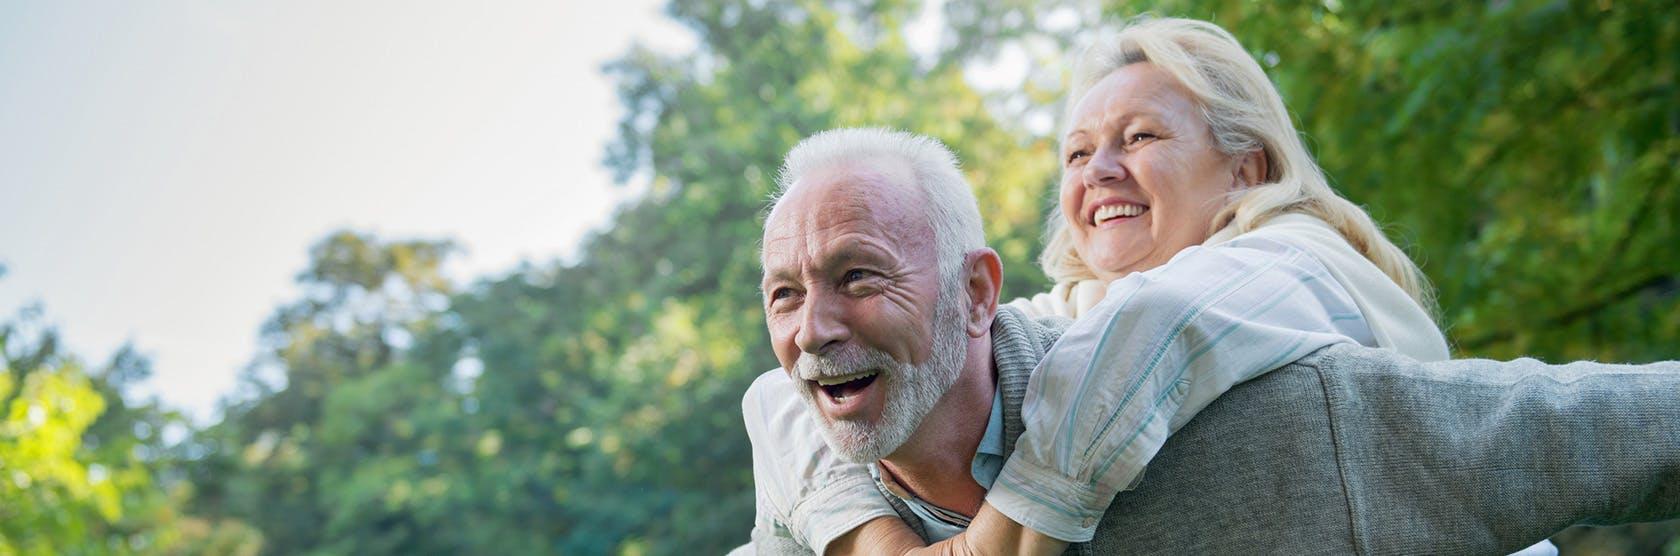 Elderly couple piggy backing